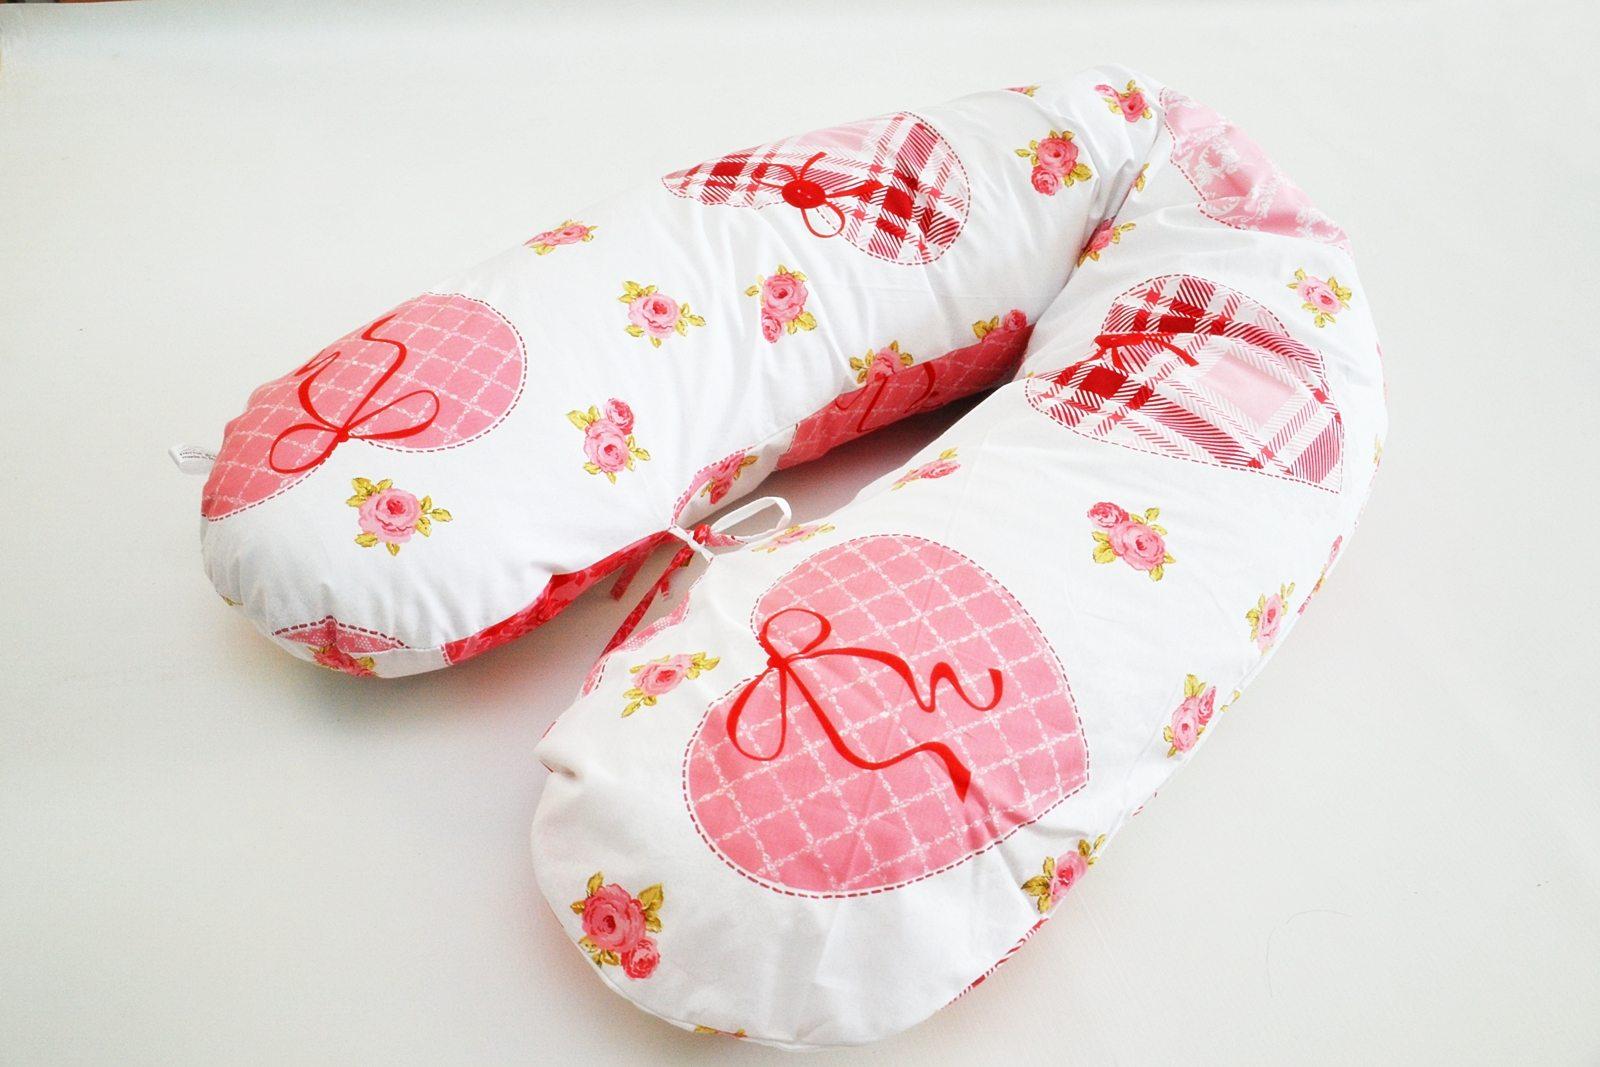 perna-cornulet-cu-inimioare-roz-4